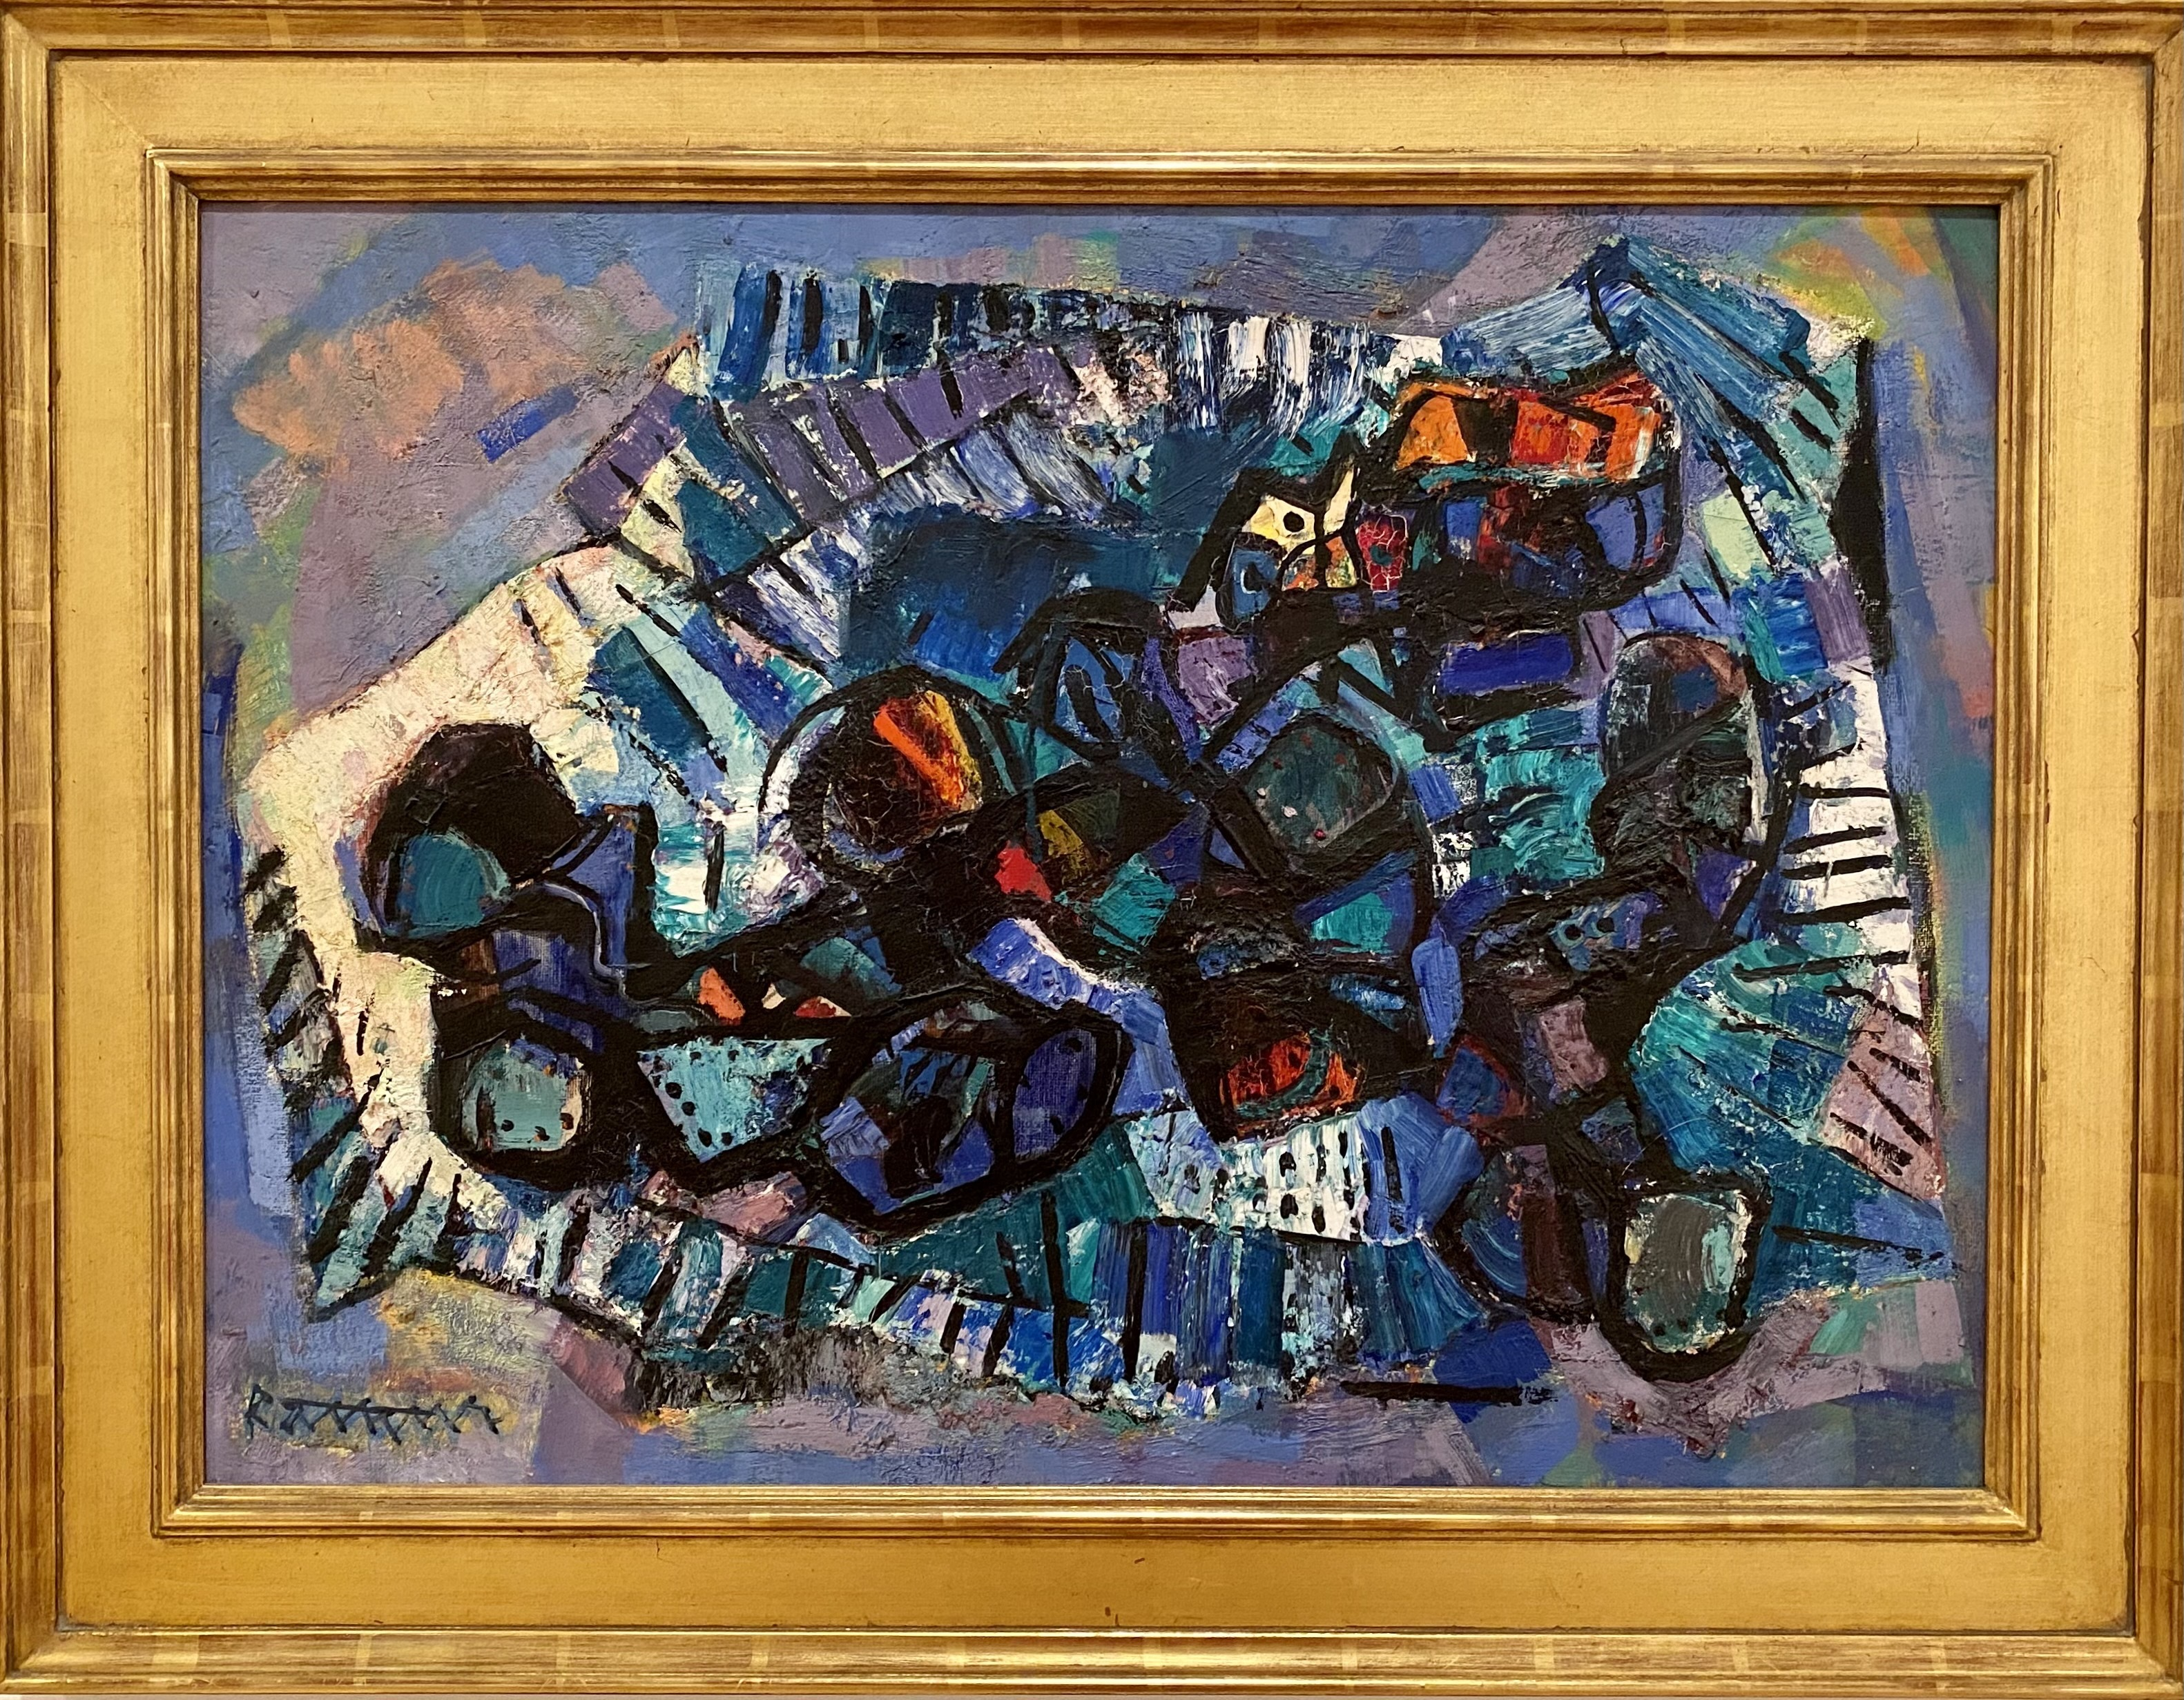 Abaham Rattner, <i> Old Shoe Arrangement No. IV </i>, 1951, Oil on canvas, Gift of Sandra and Howard Fromson